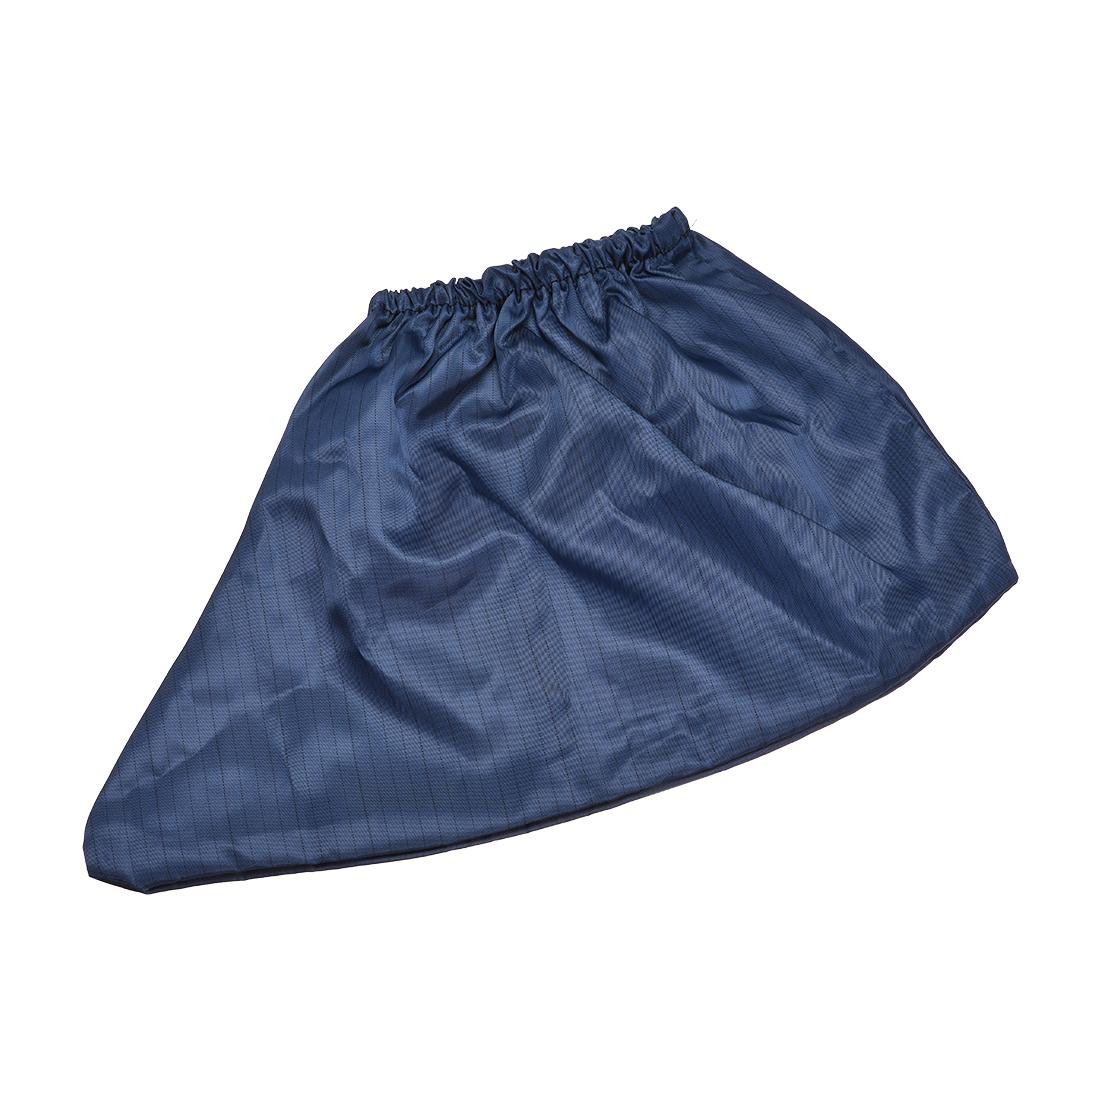 Anti Static Shoe Covers Slip Resistant Boot Cover Dark Blue 1Pair